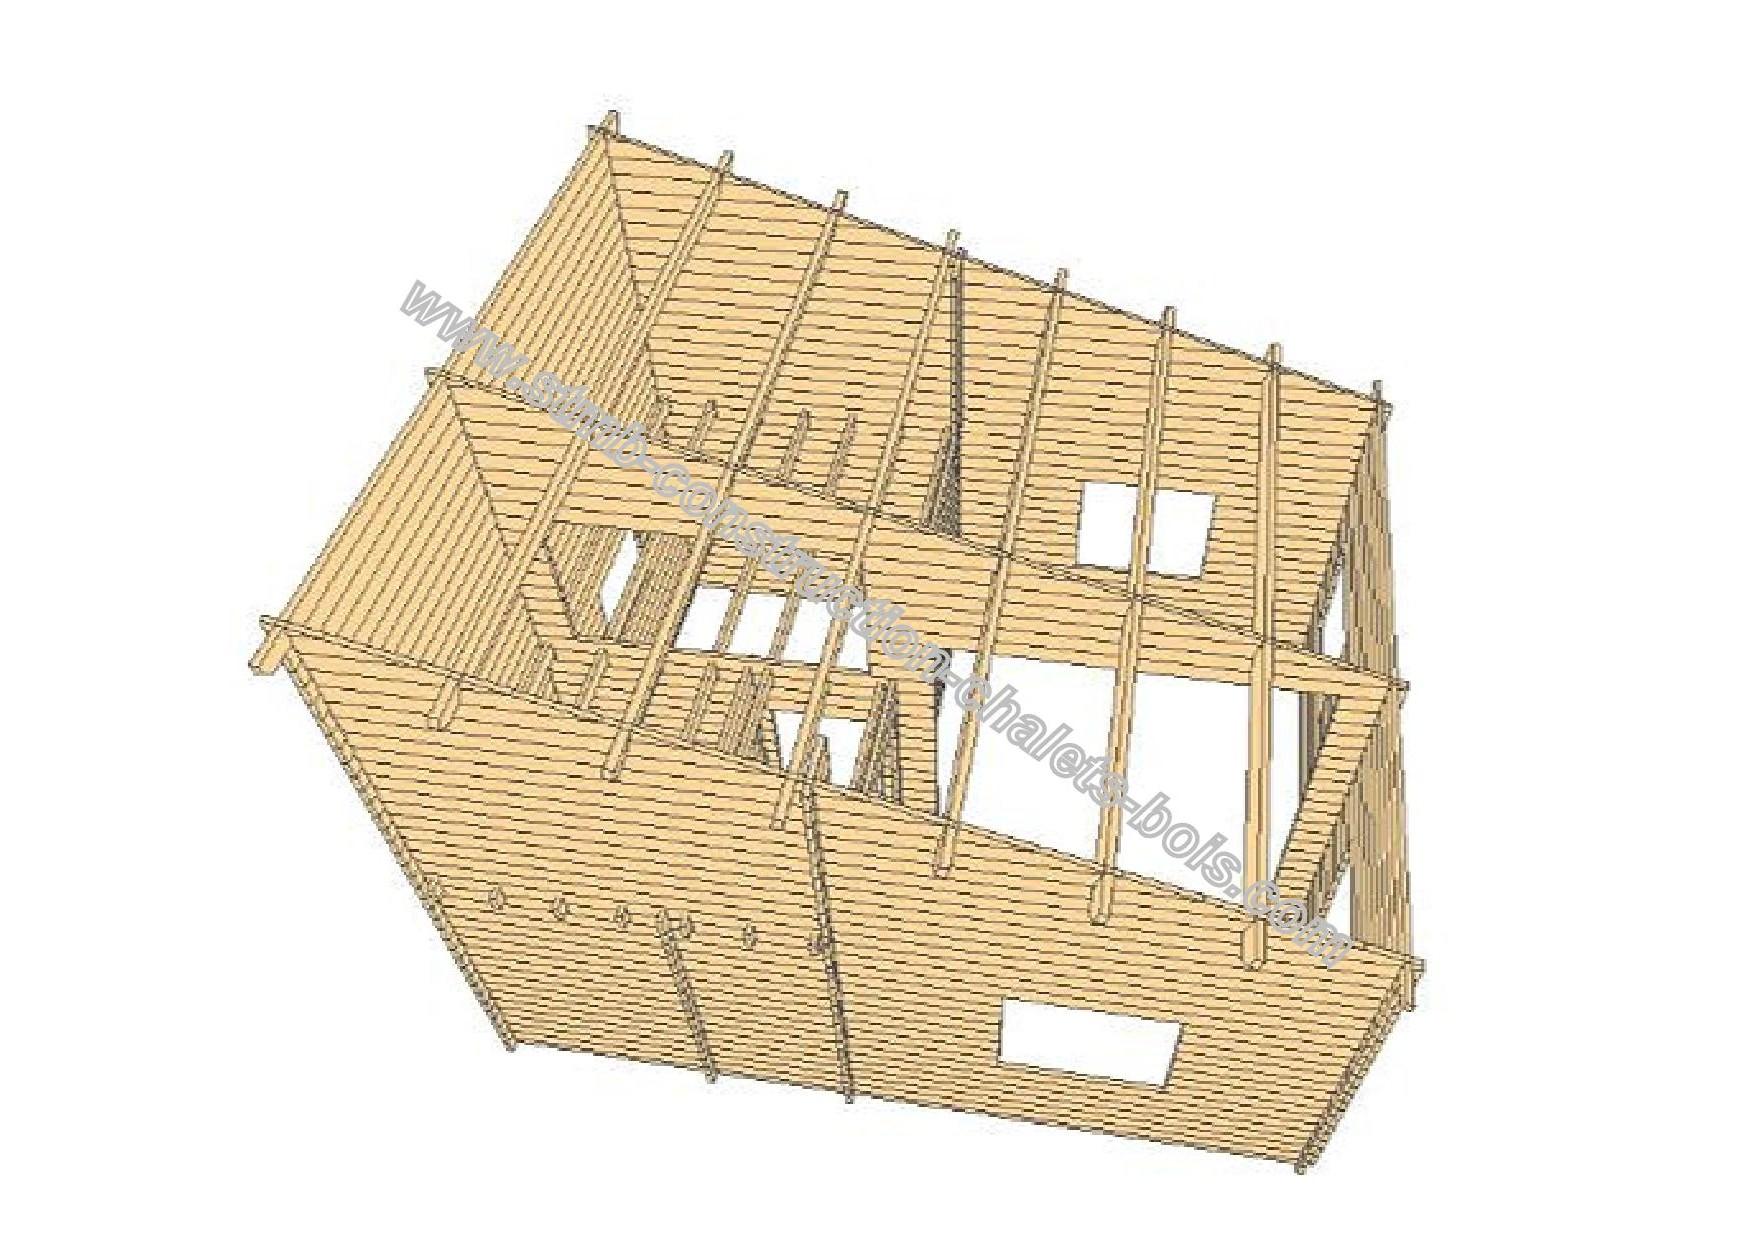 Chalet bois en kit albertville 36 m mezzanine 15 m for Abri de jardin 20m2 habitable avec mezzanine